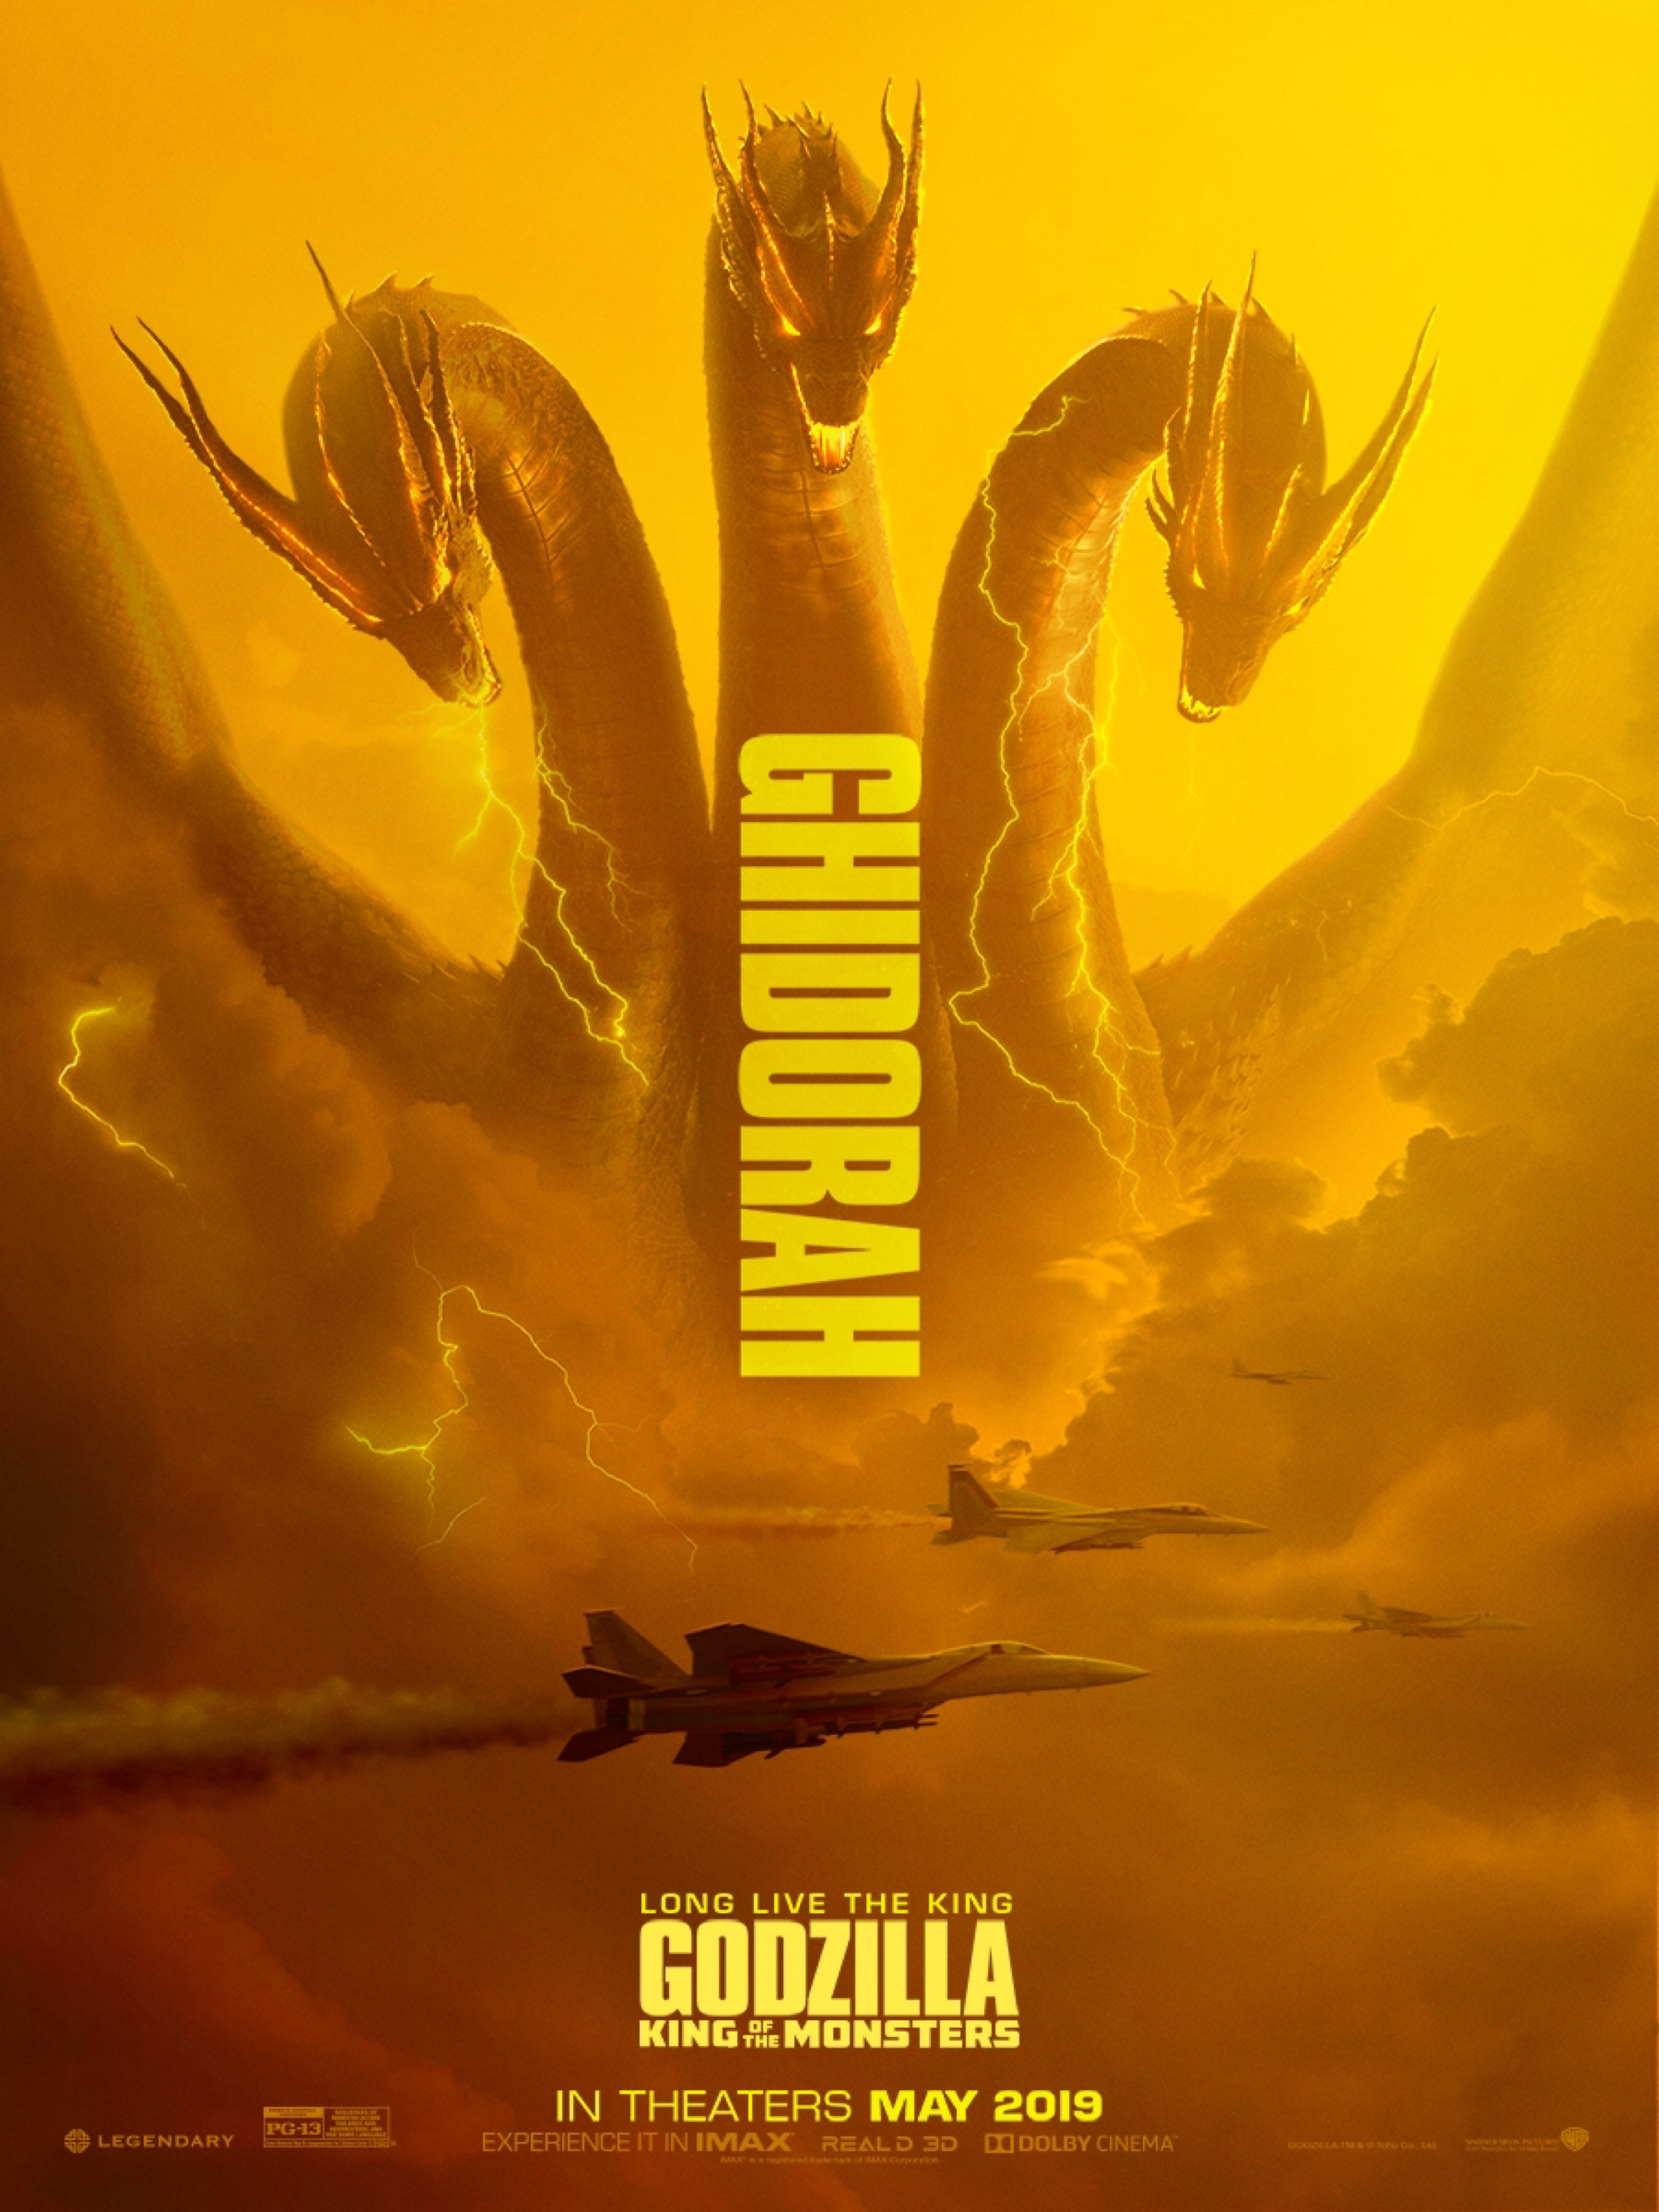 design 3 Godzilla official movie poster